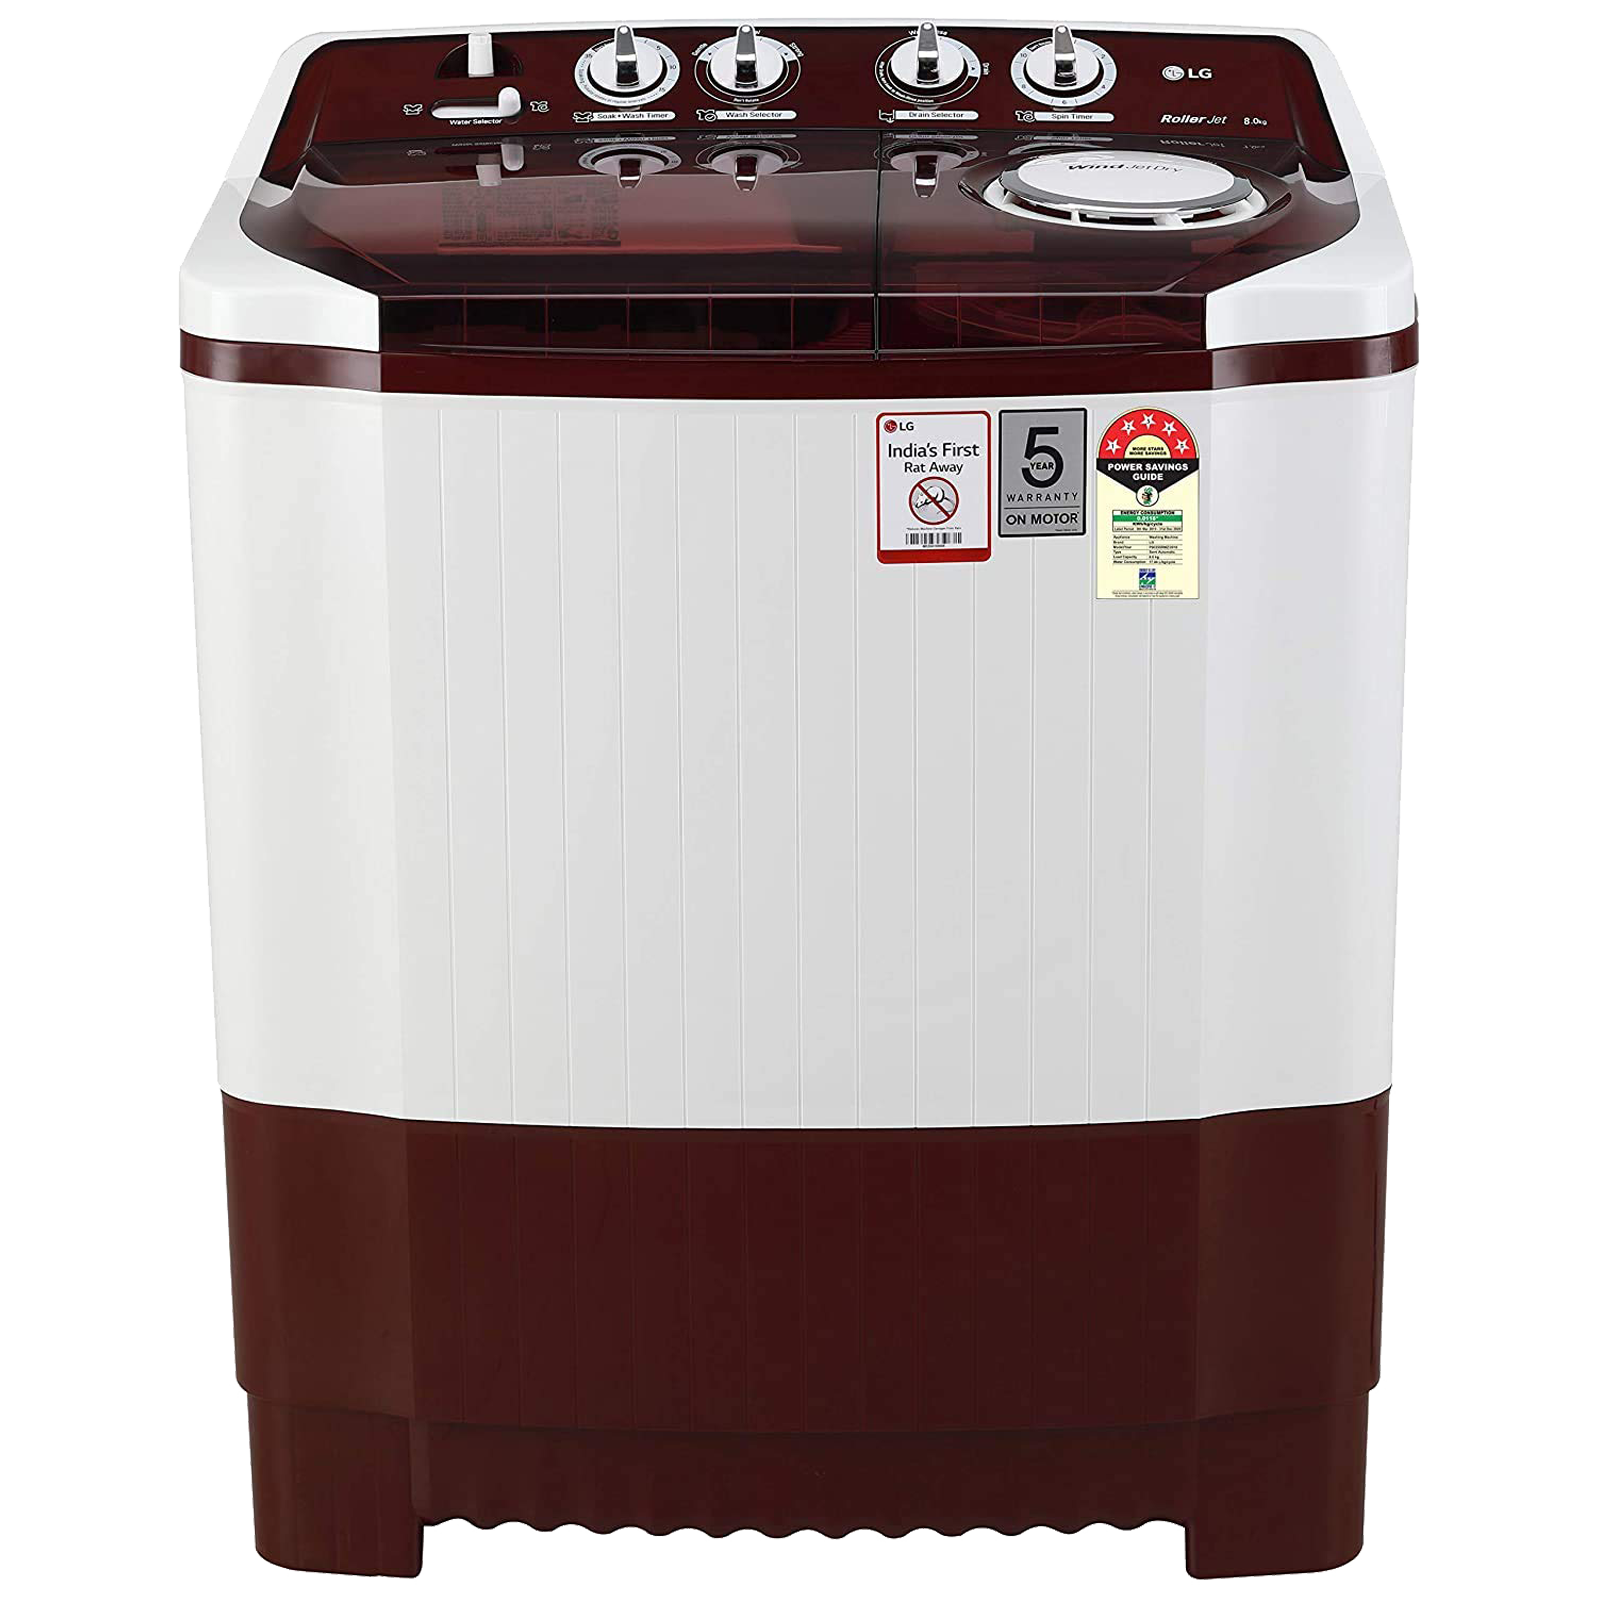 LG 8 kg 5 Star Semi-Automatic Top Load Washing Machine (Auto Restart, P8035SRMZ.ABGQEIL, Burgundy)_1